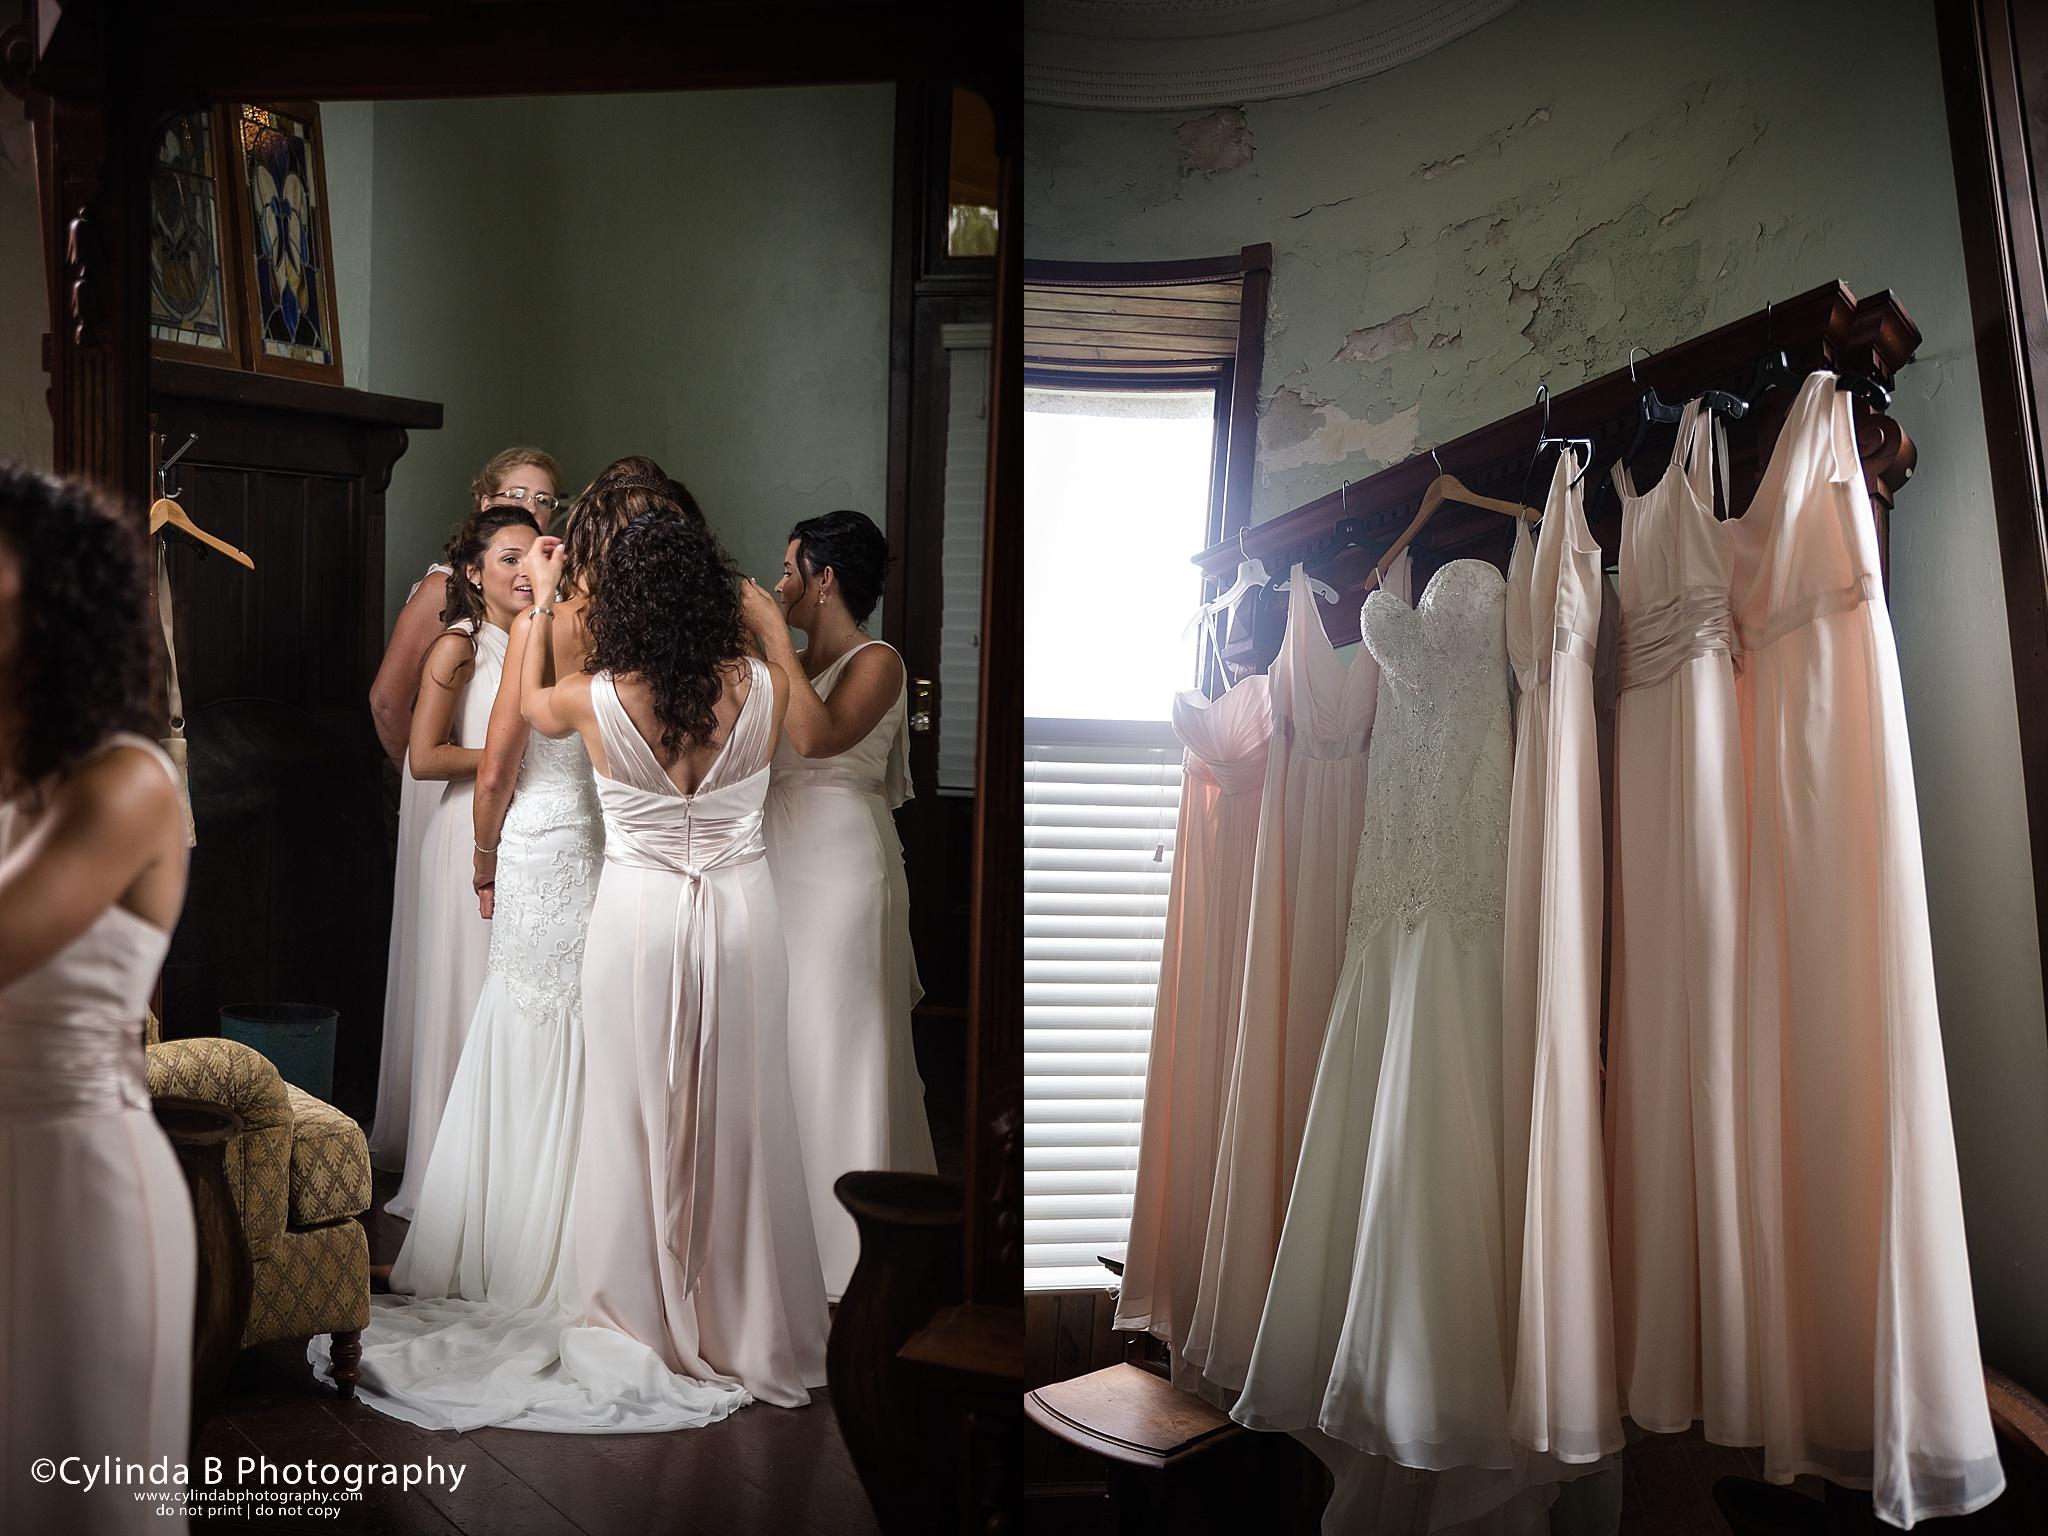 boldt castle wedding alexandria bay wedding photograper cylinda b photography 9